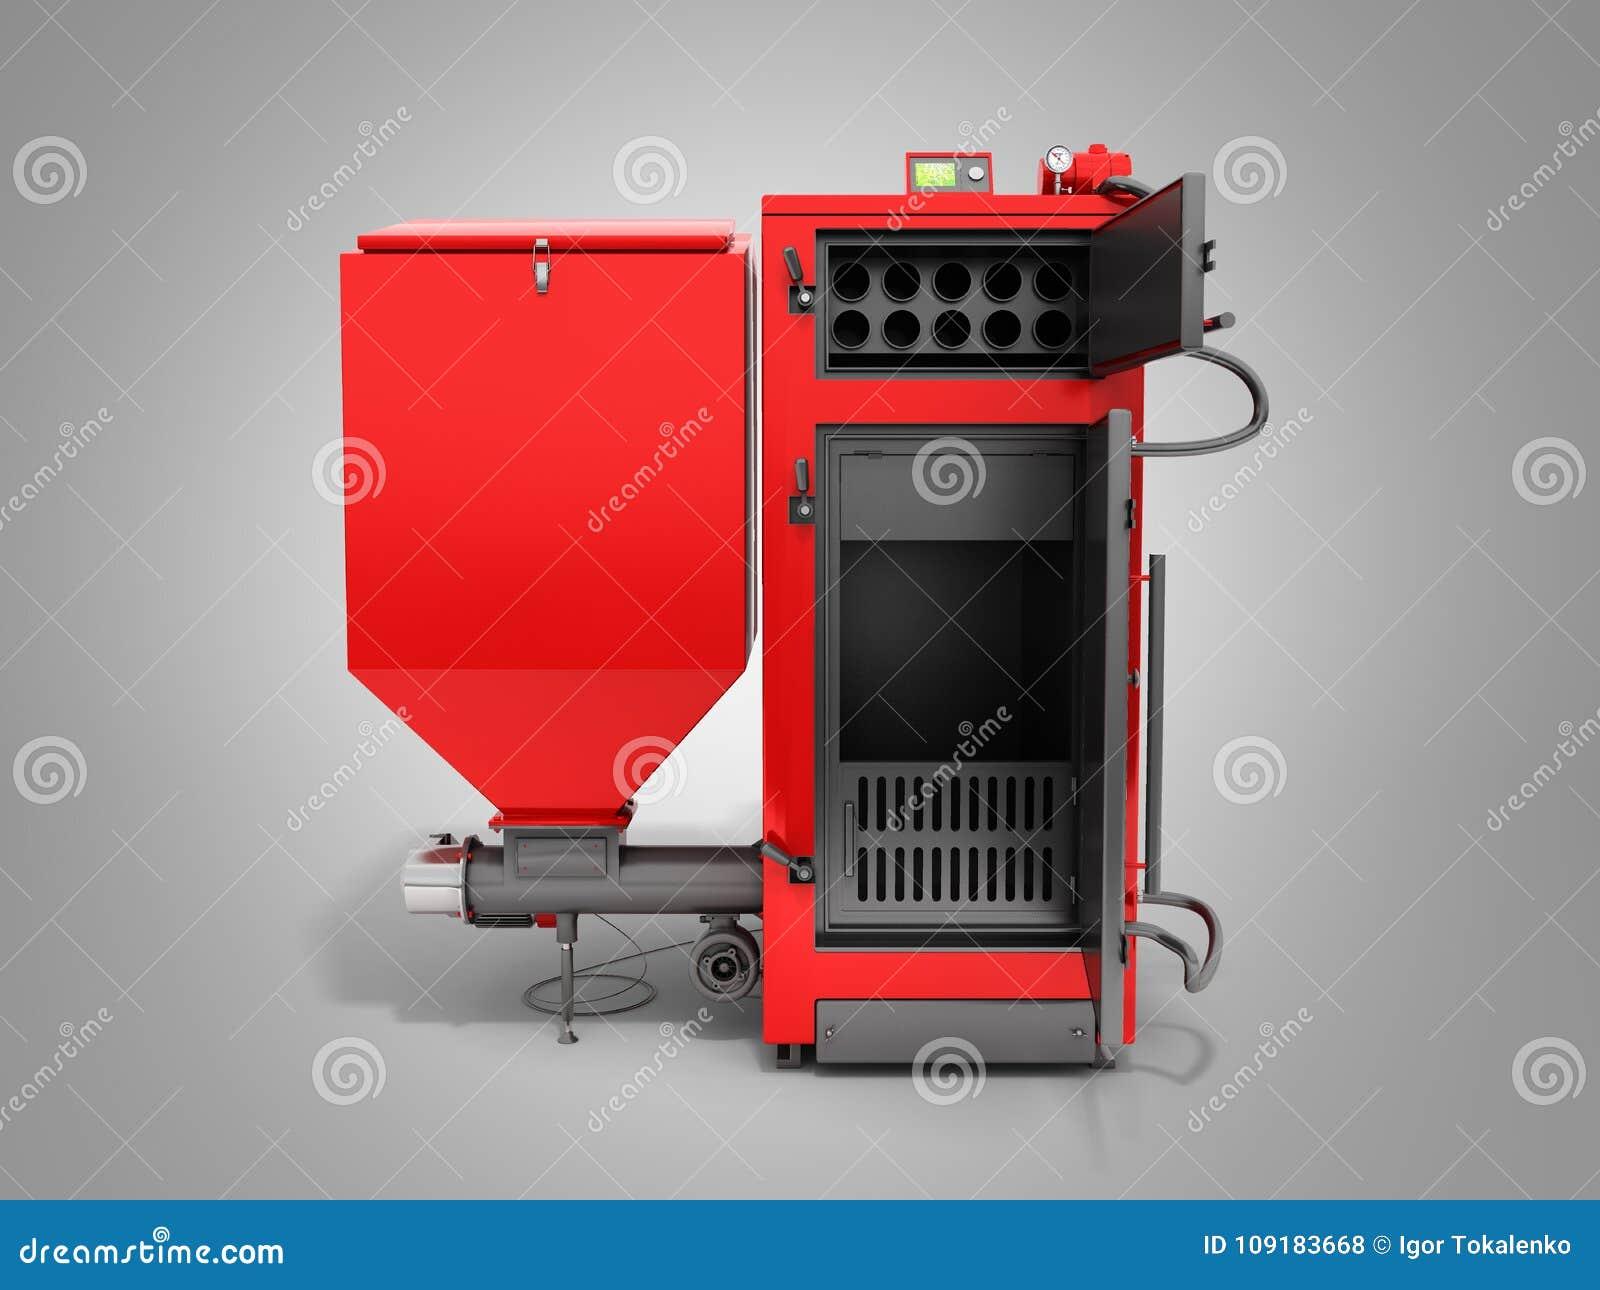 Solid fuel boiler 3D rendered image in grey